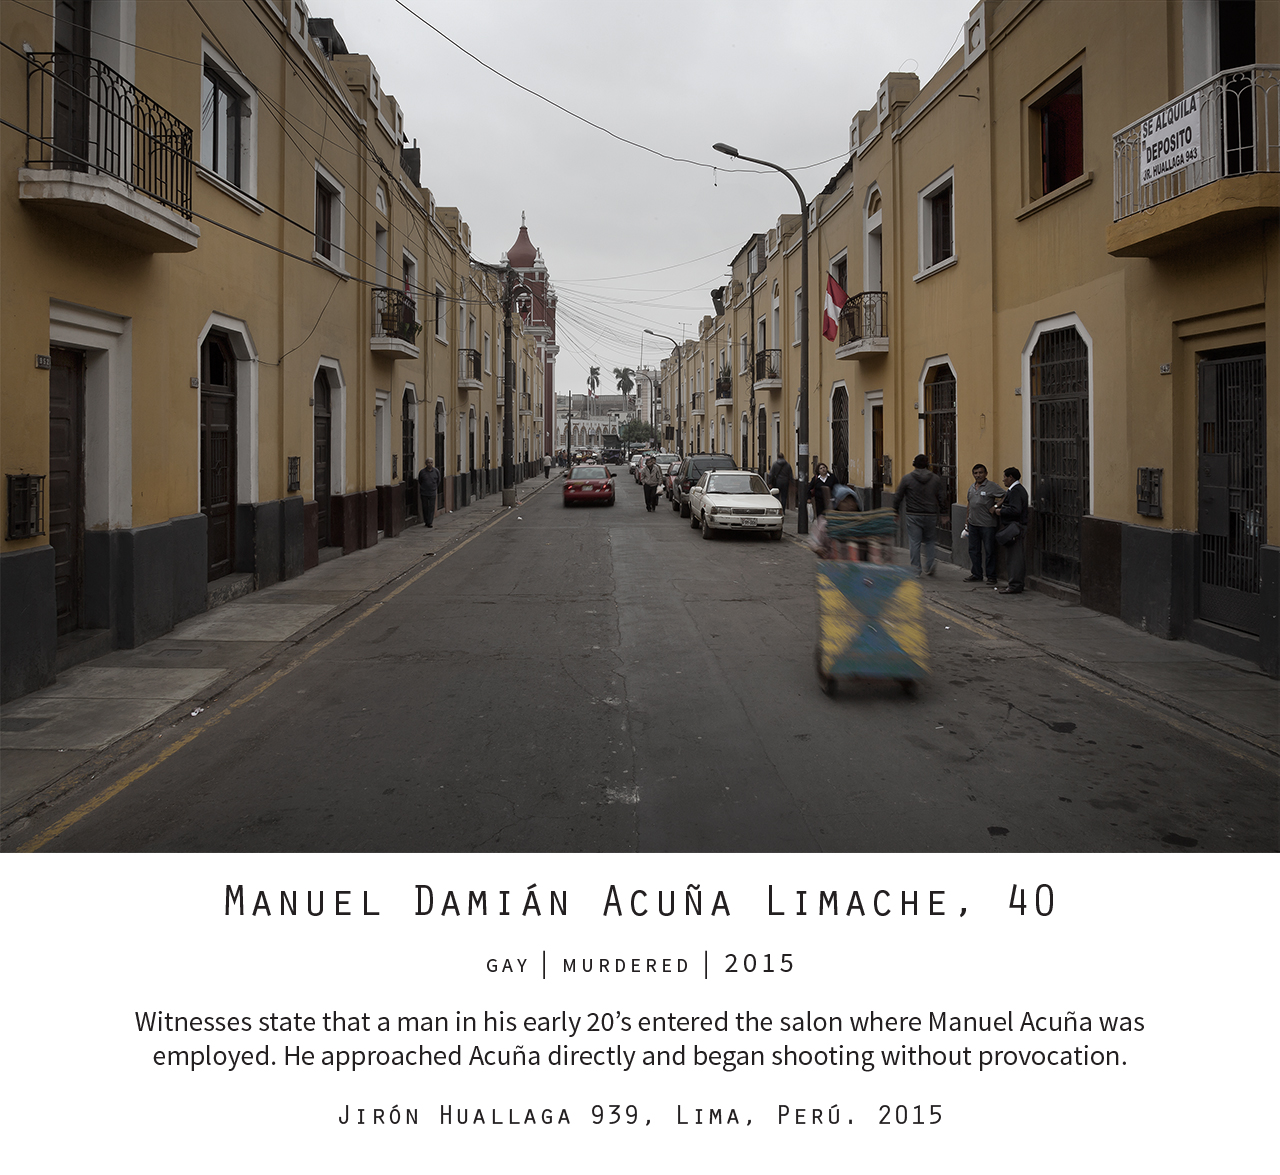 ManuelAcuna.jpg